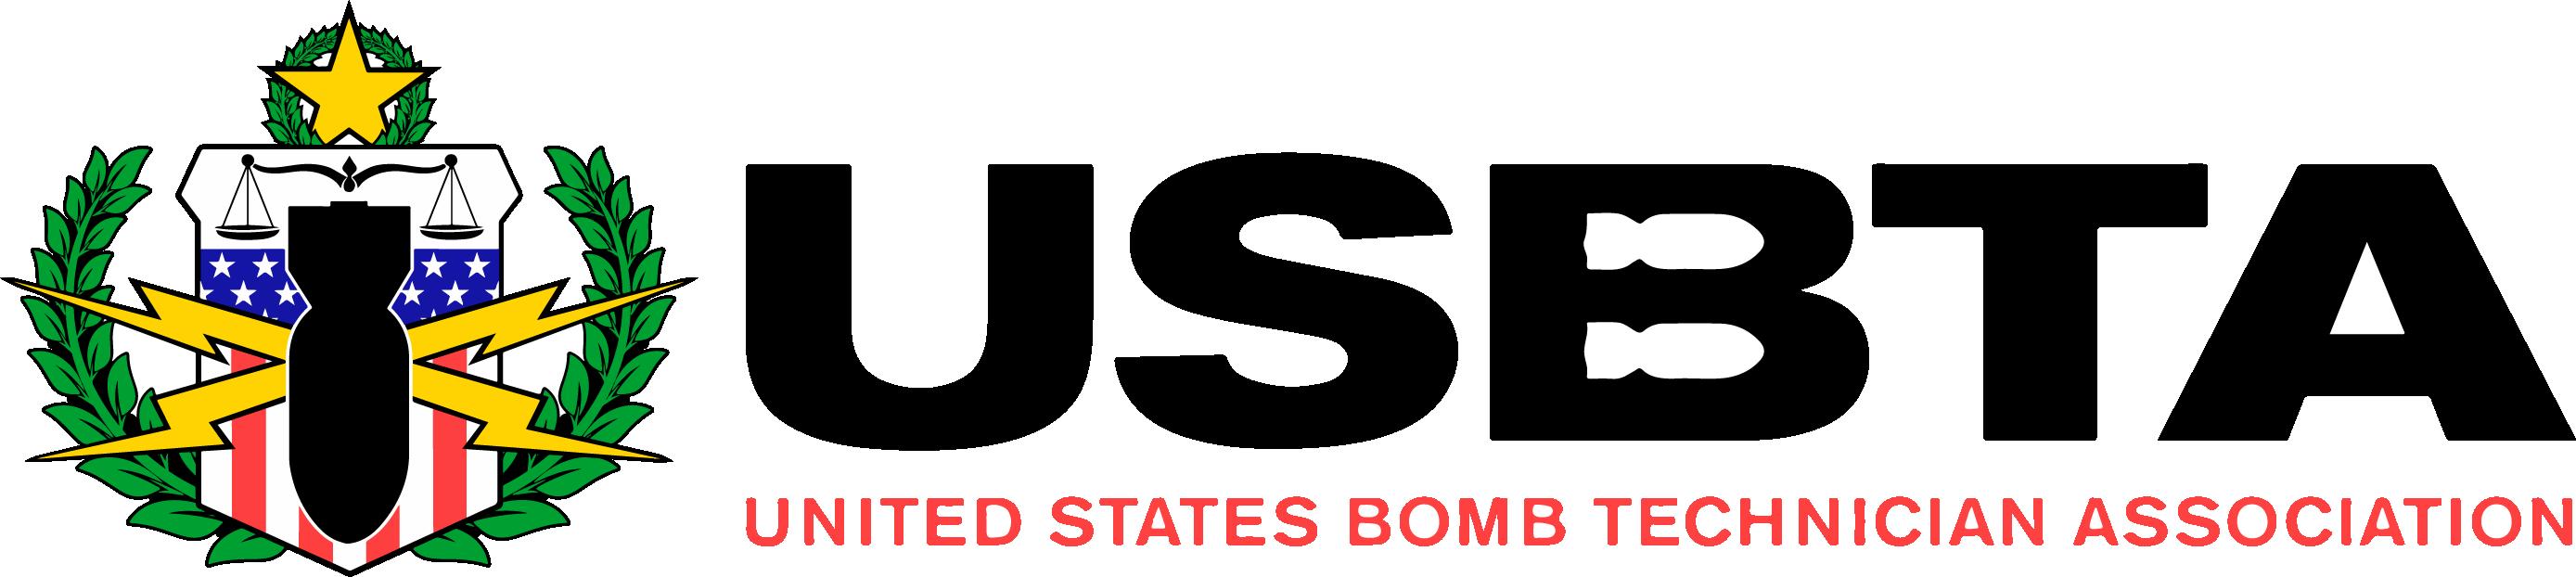 United States Bomb Technician Association